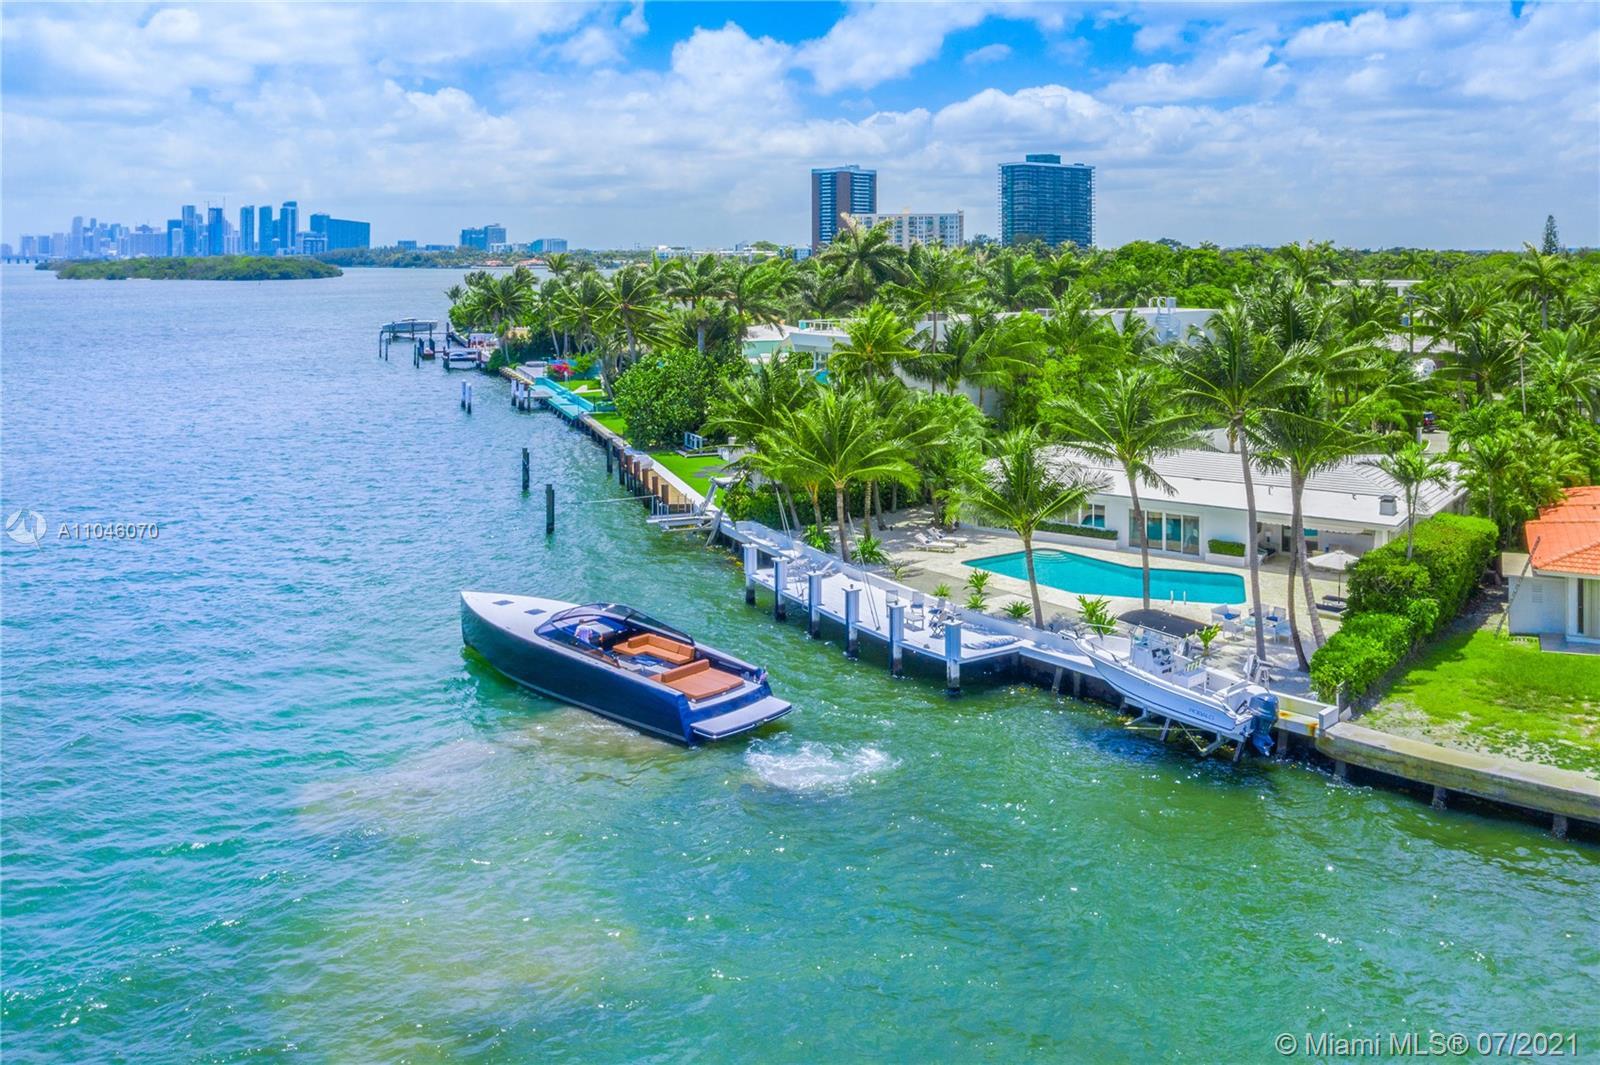 Belle Meade - 1161 Belle Meade Island Dr, Miami, FL 33138